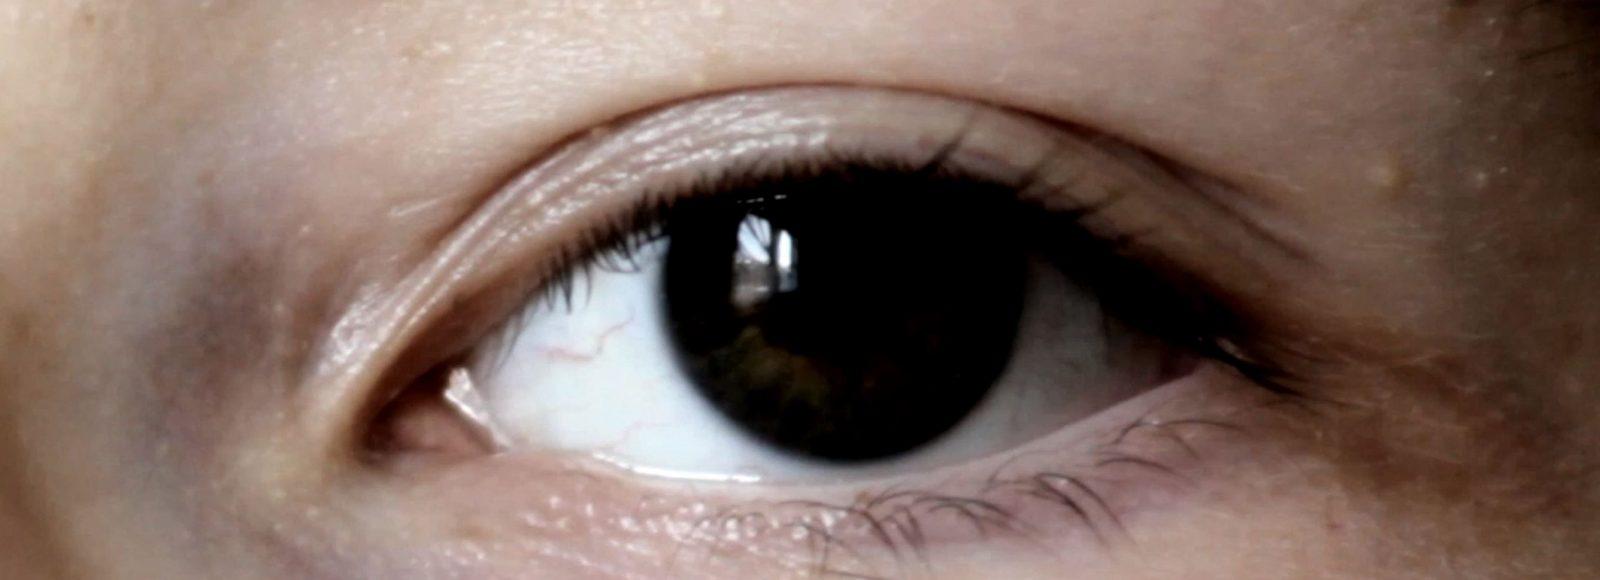 reading eye